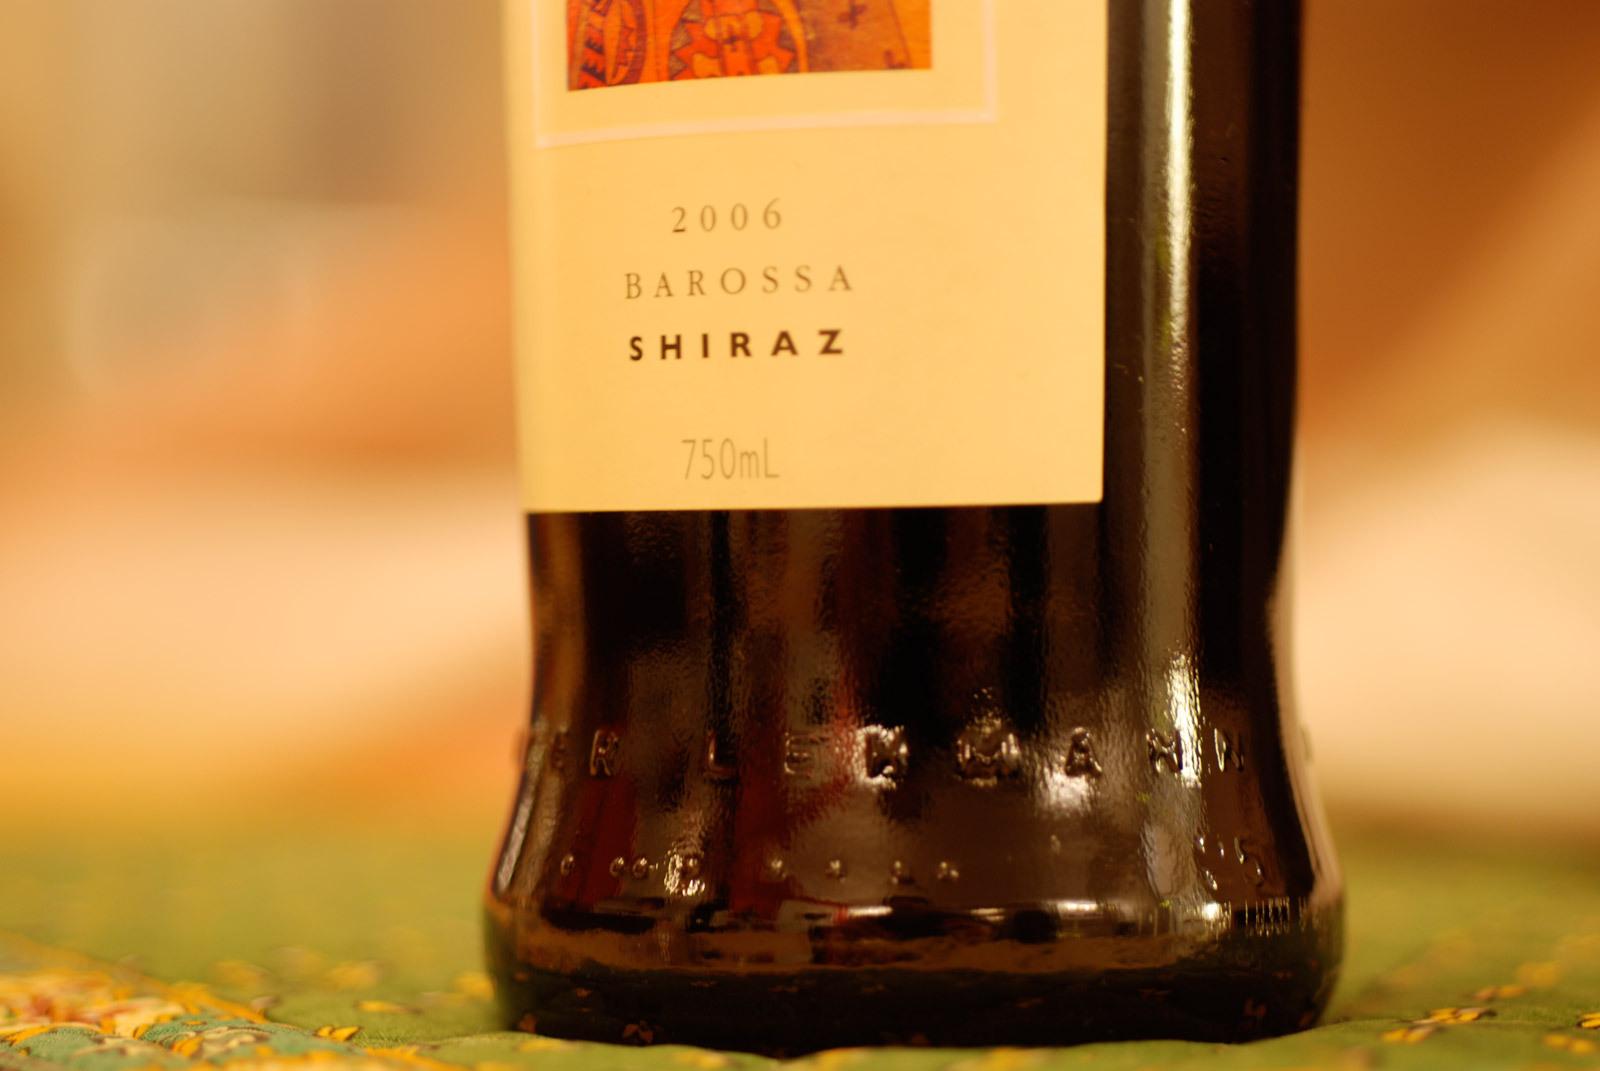 Wine_labelled_as_a_Barossa_Shiraz